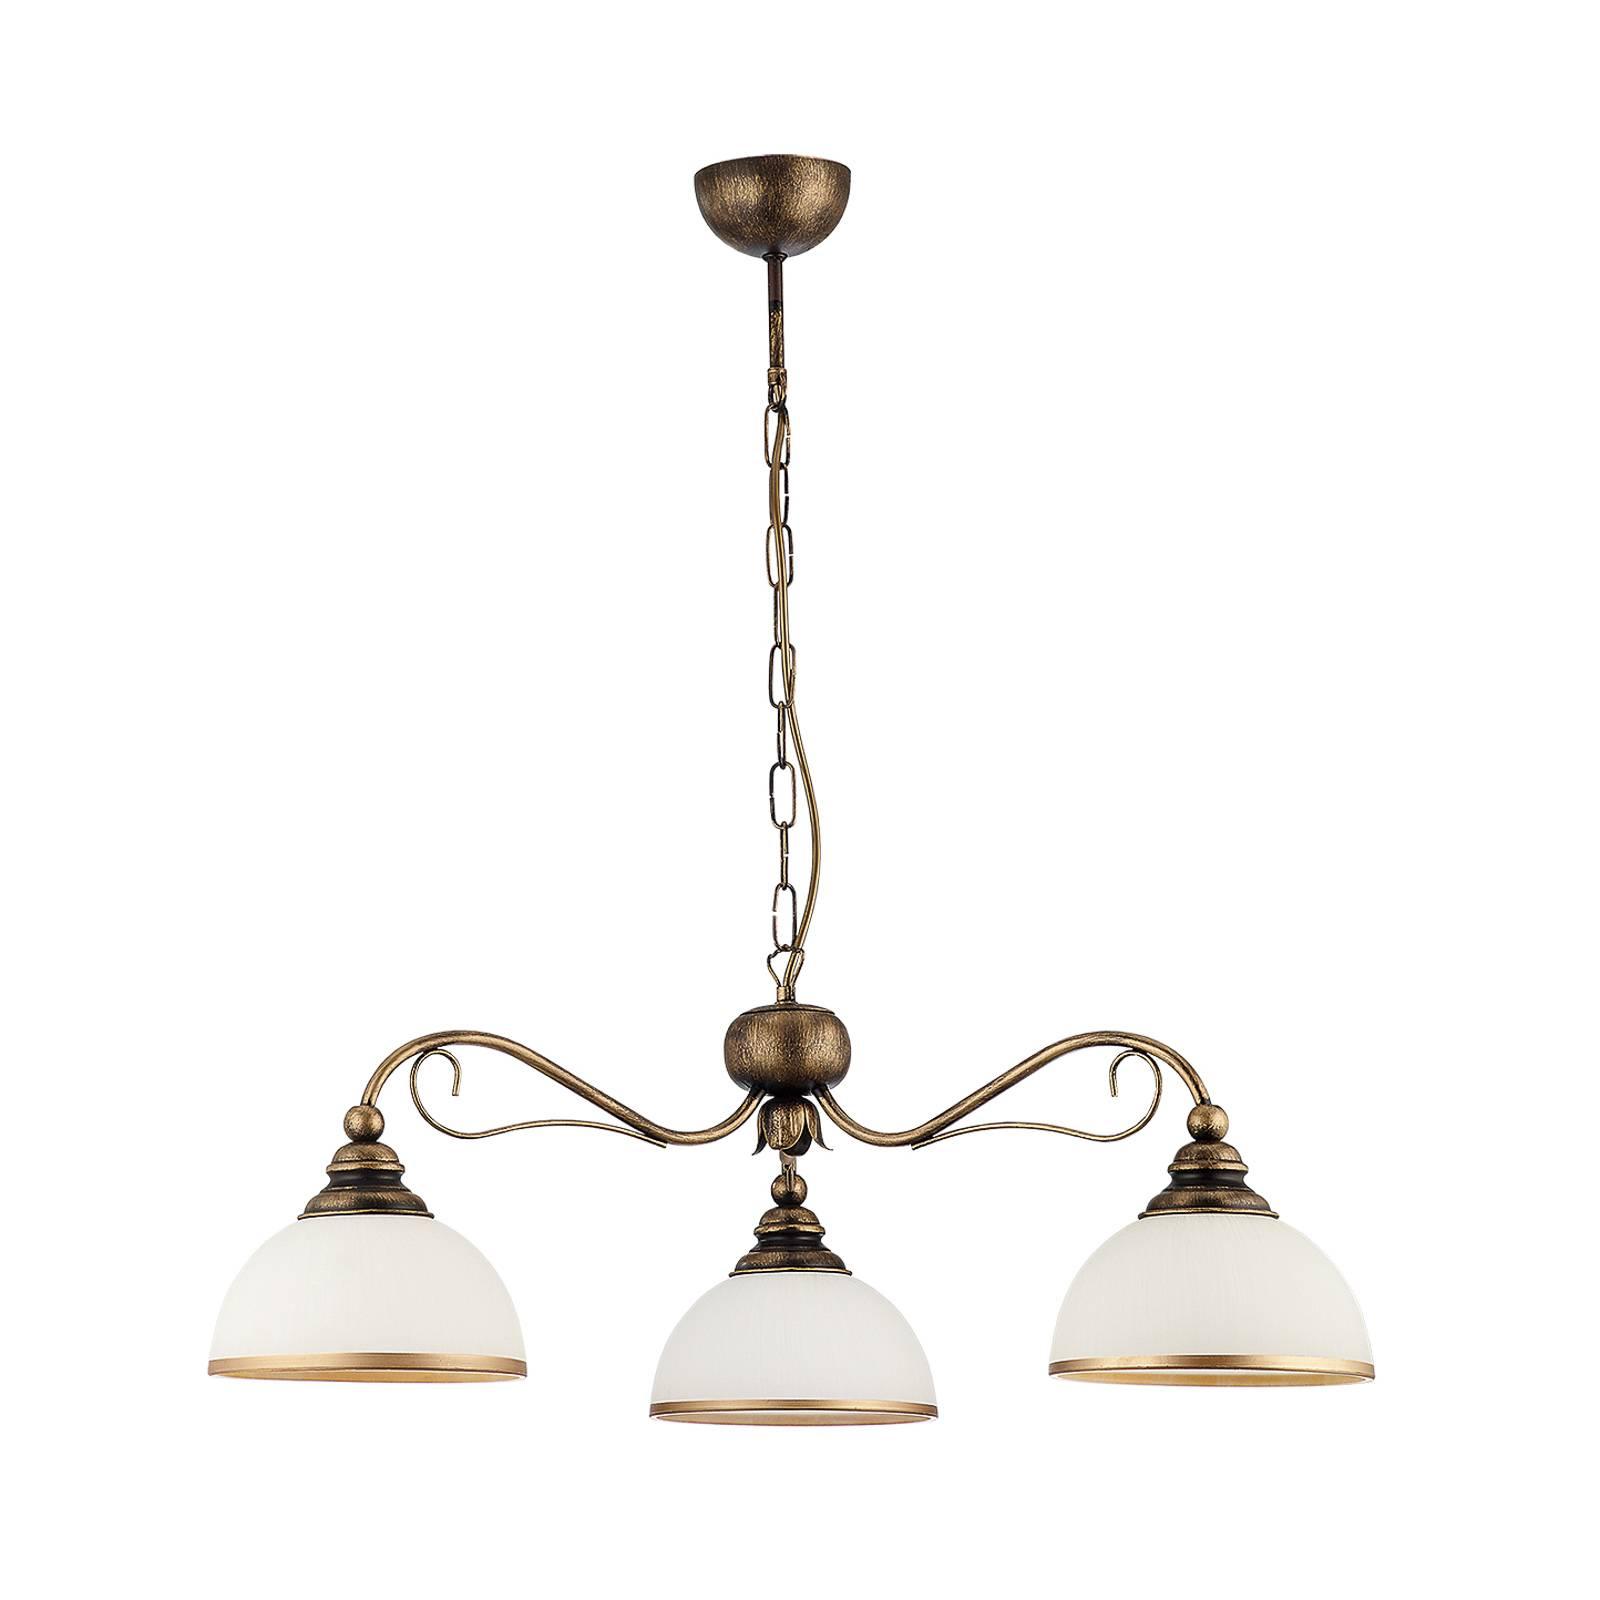 Riippuvalo Casale, 3-lamppuinen, Ø 74 cm